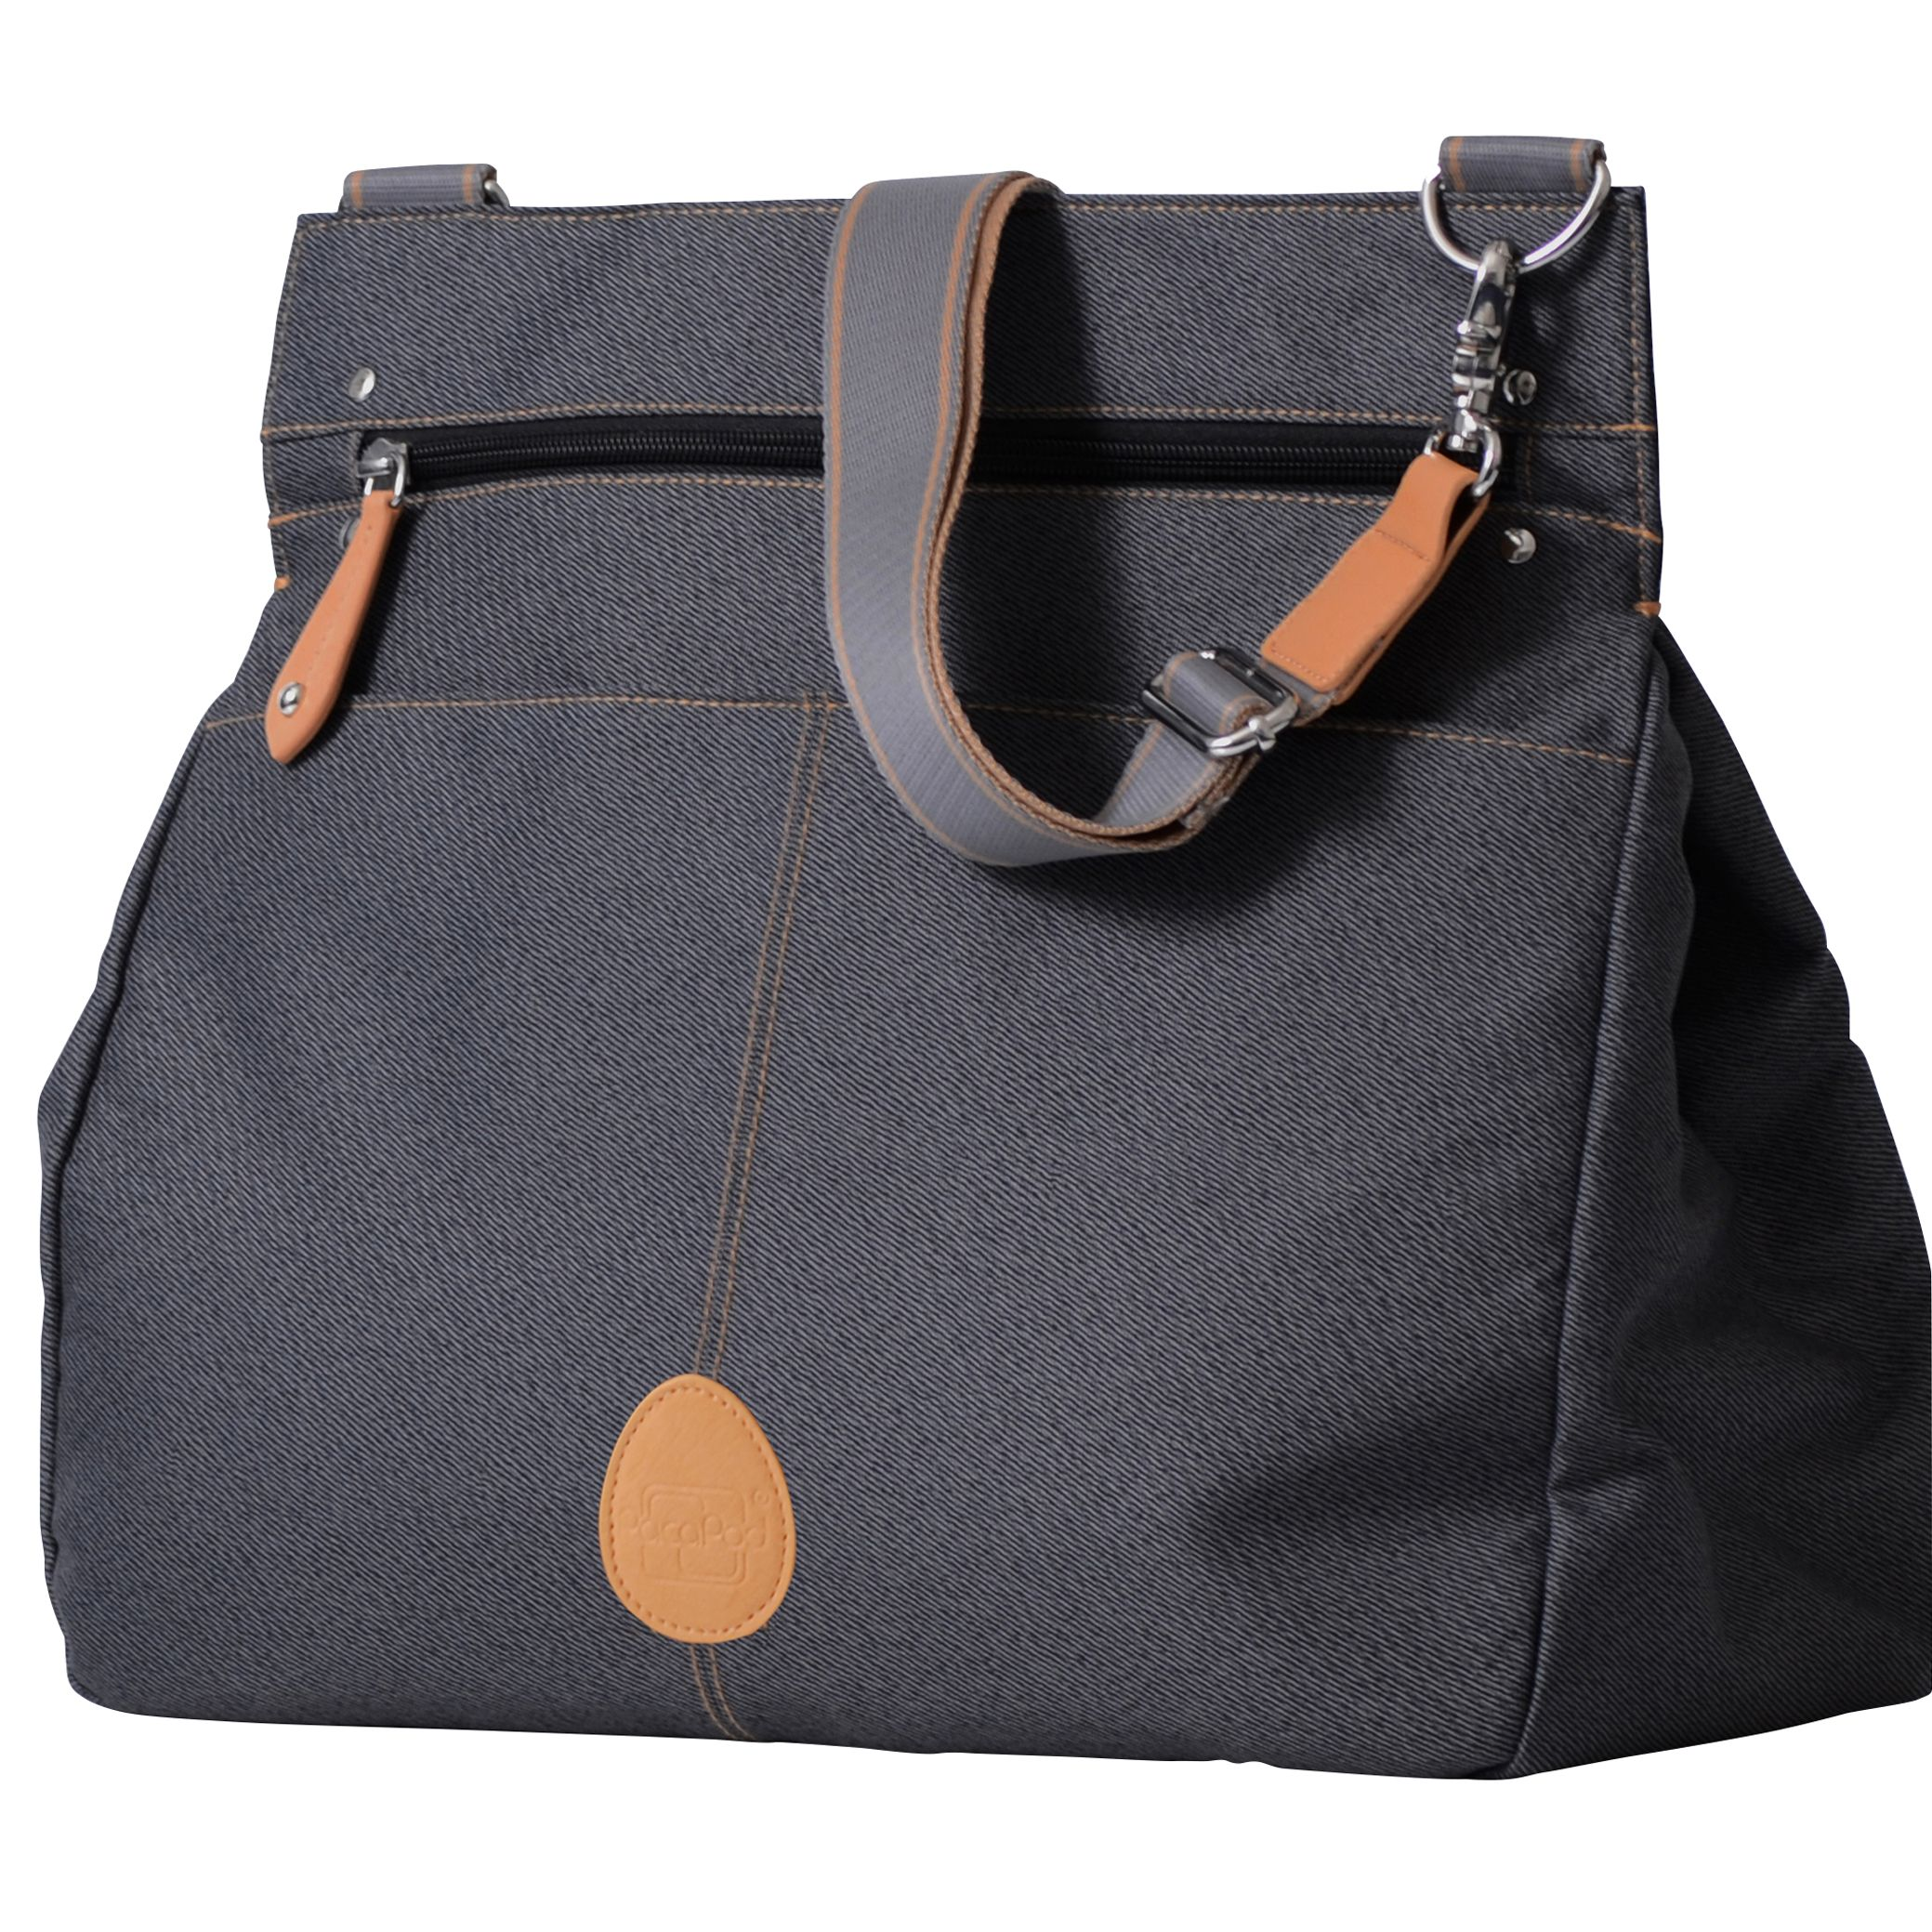 PacaPod PacaPod Oban Changing Bag, Black Charcoal